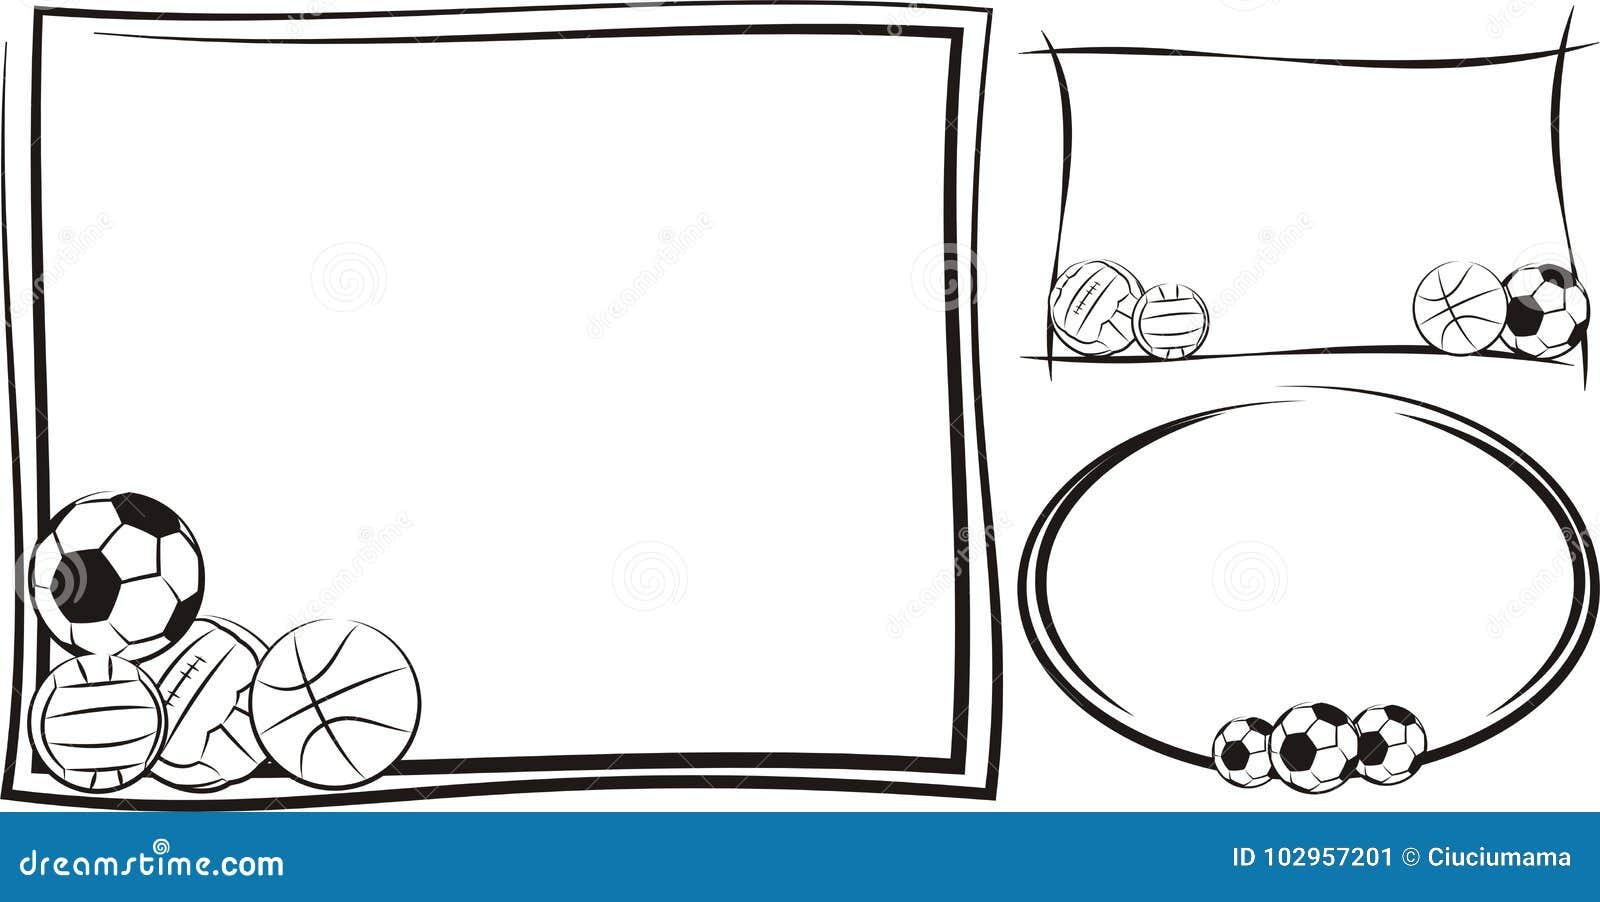 Soccer, Football, Basketball, Volleyball Frame Or Banner Stock ...